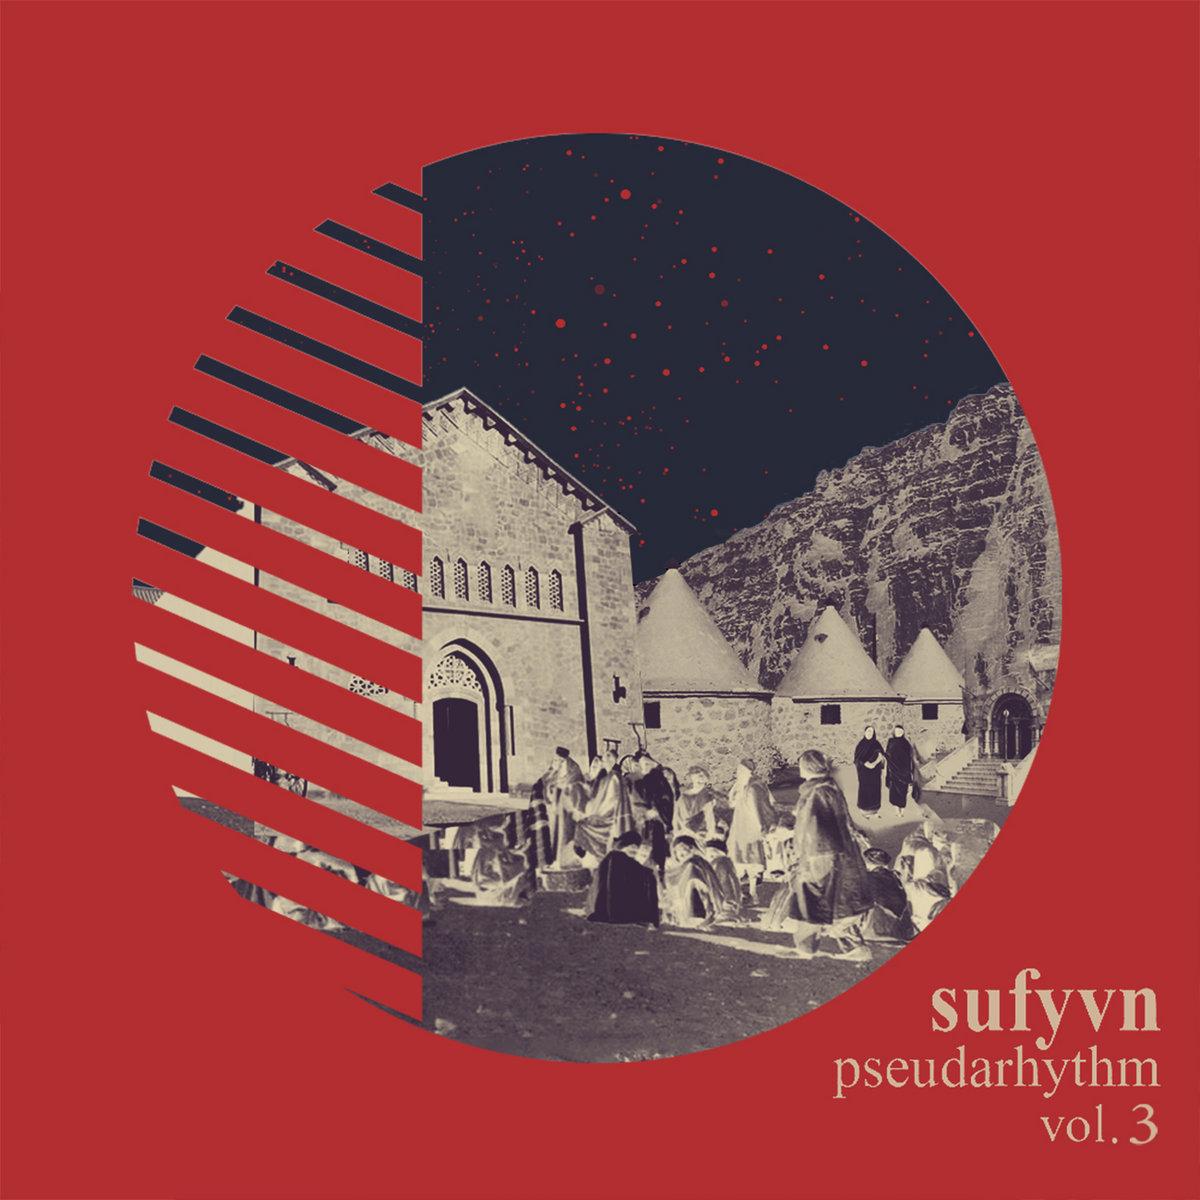 Sufyvn – Pseudarhythm, Vol. 3